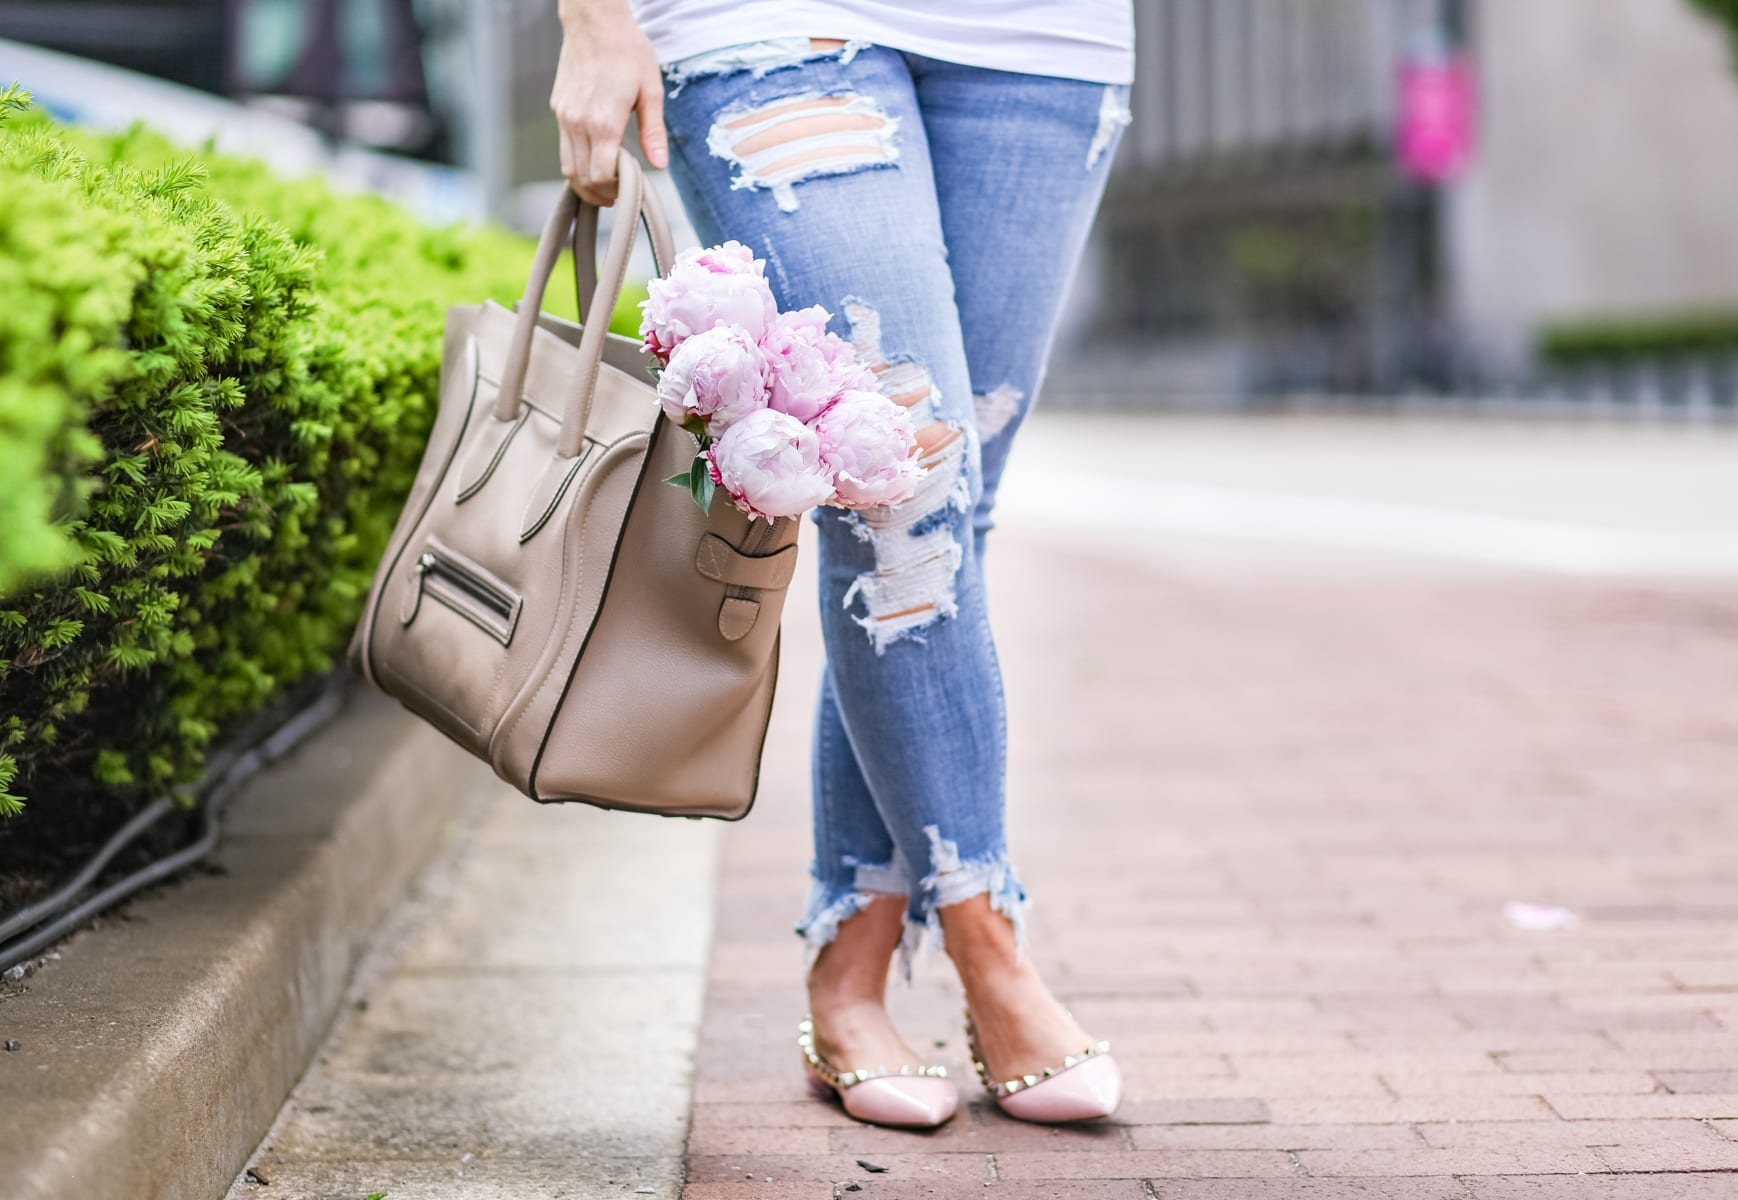 Ashley Pletcher - Celine bag - ripped jeans - flowers - peonies - fashion blogger - maternity - mom blog